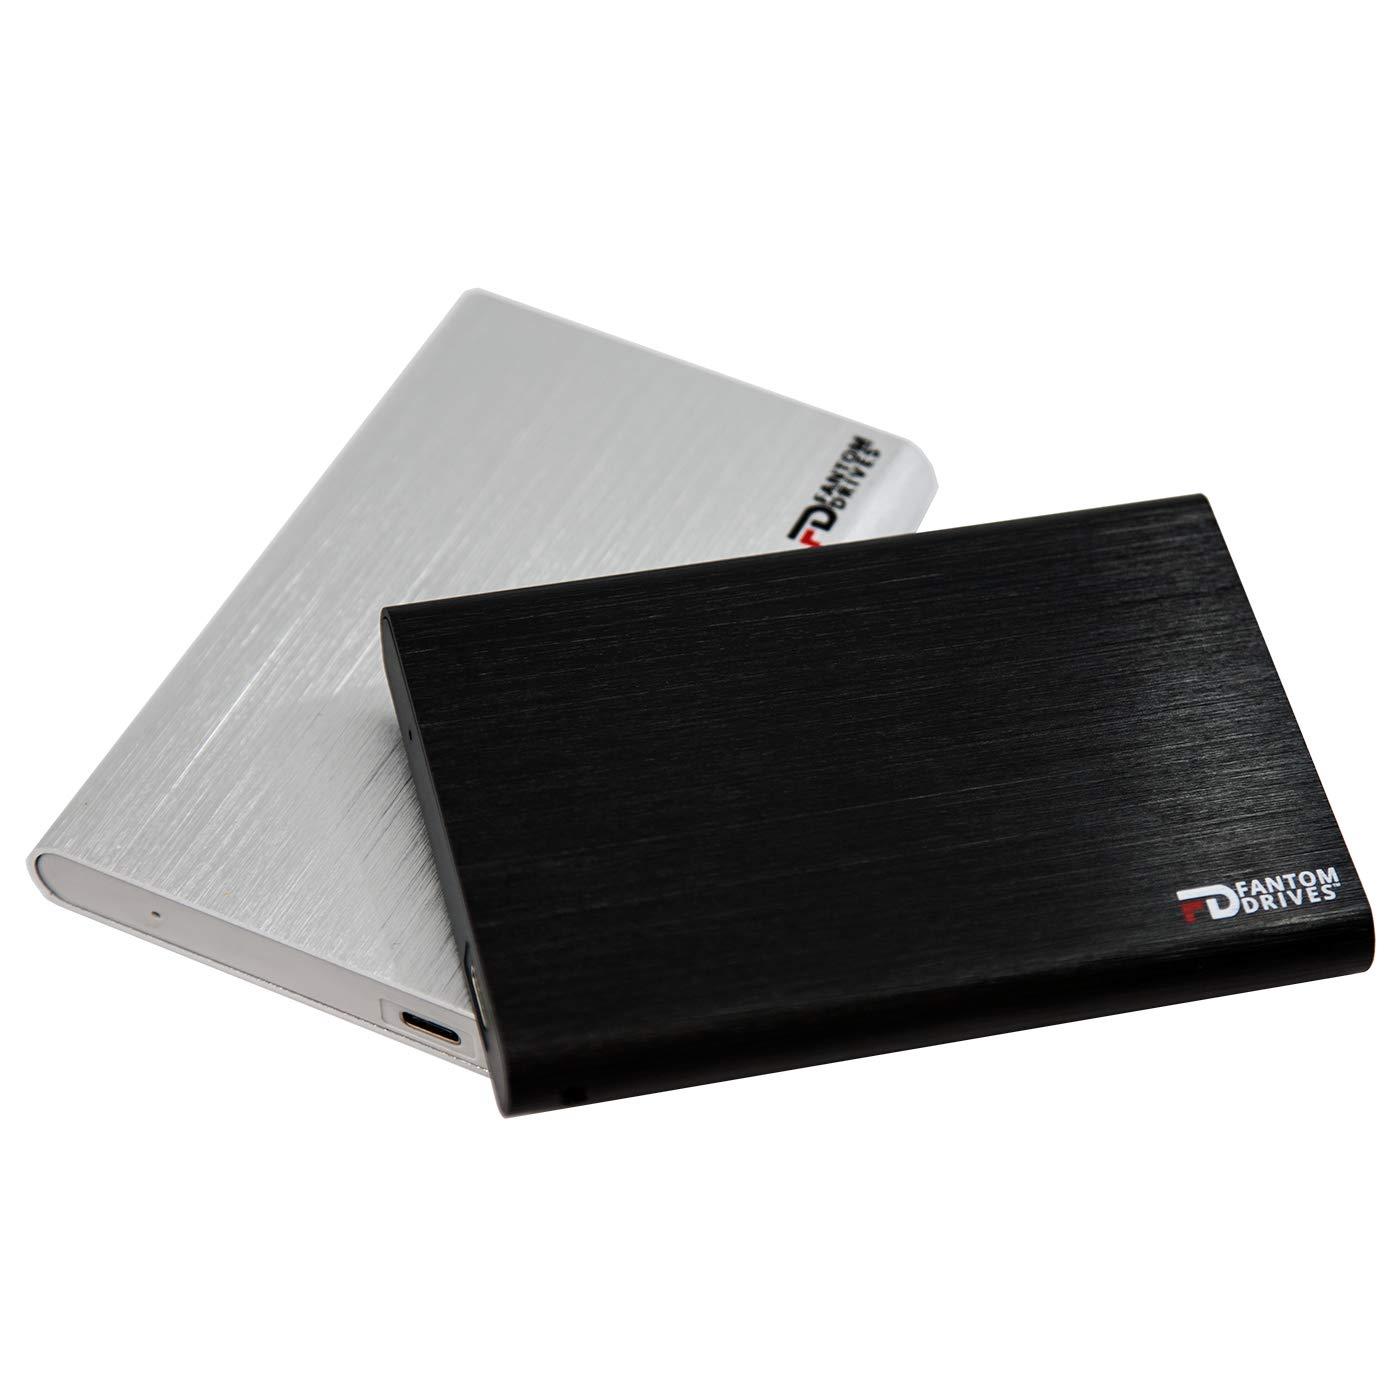 Fantom Drives External SSD 2TB USB 3.1 Gen 2 Type-C 10Gb/s - Silver - Windows - GFORCE 3.1 Portable SSD Series by Fantom Drives (Image #3)